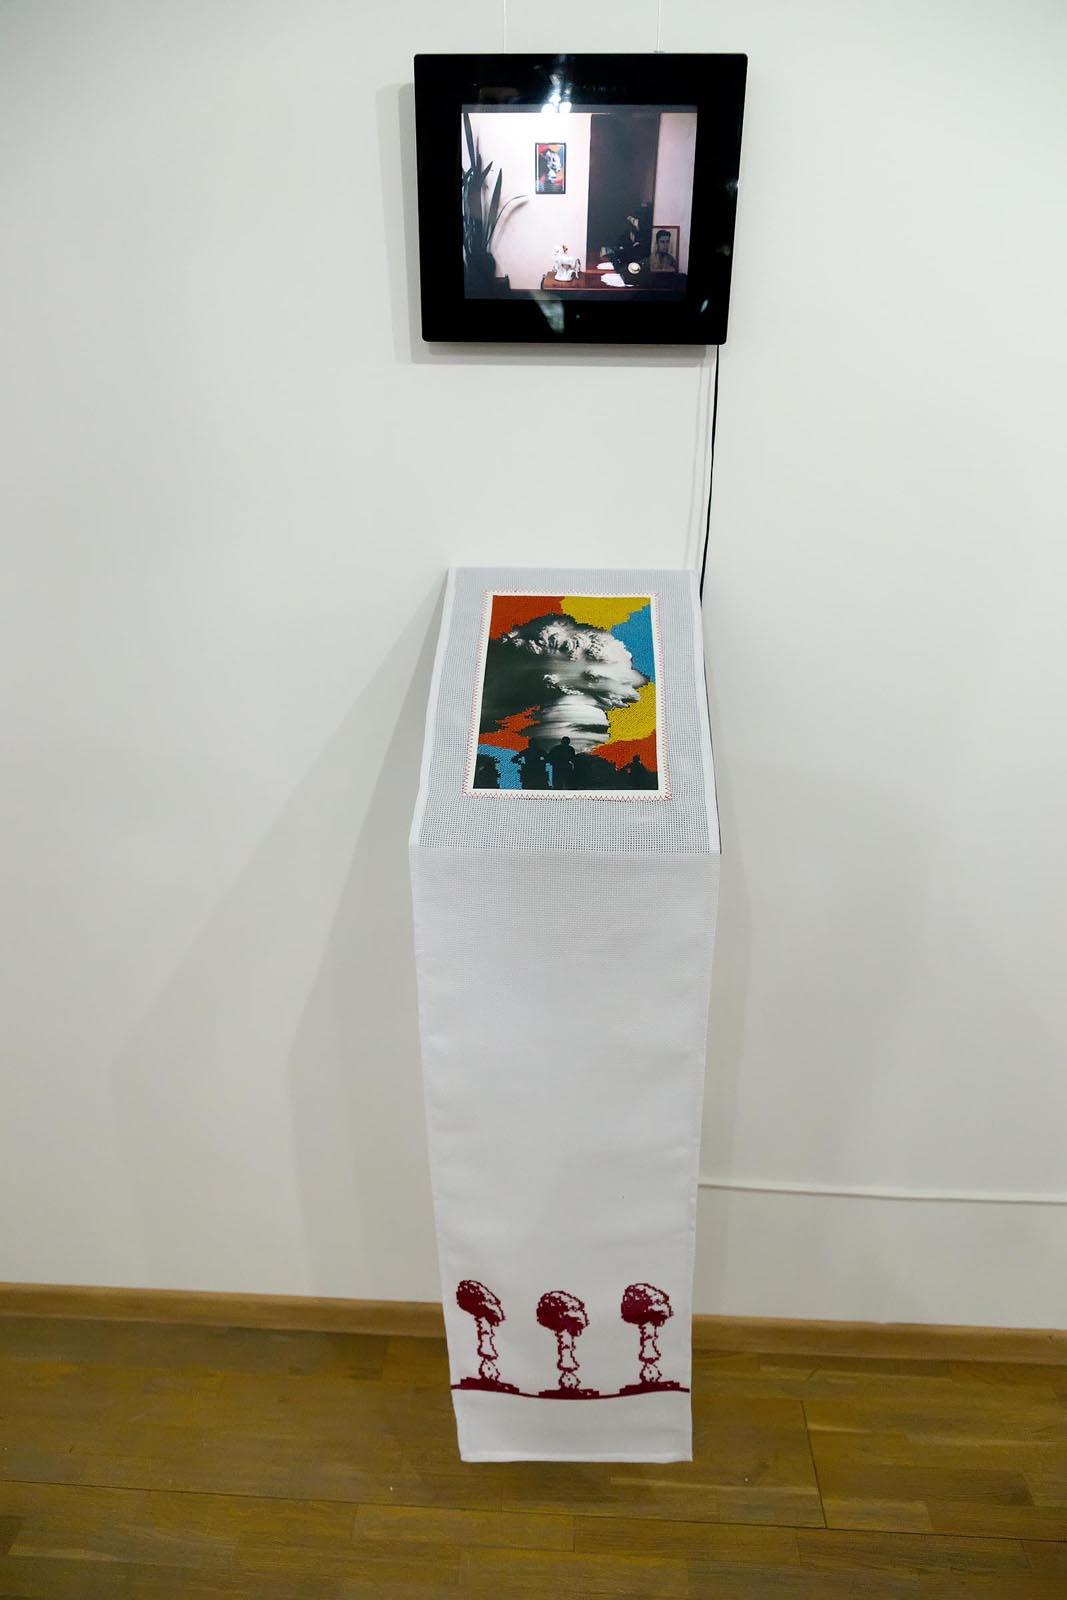 Фото №225652. МОСКВА-XVI или ВЫШИТЫЕ ДНИ. Андрей Суздалев.  Москва.  Инсталляция, 2014